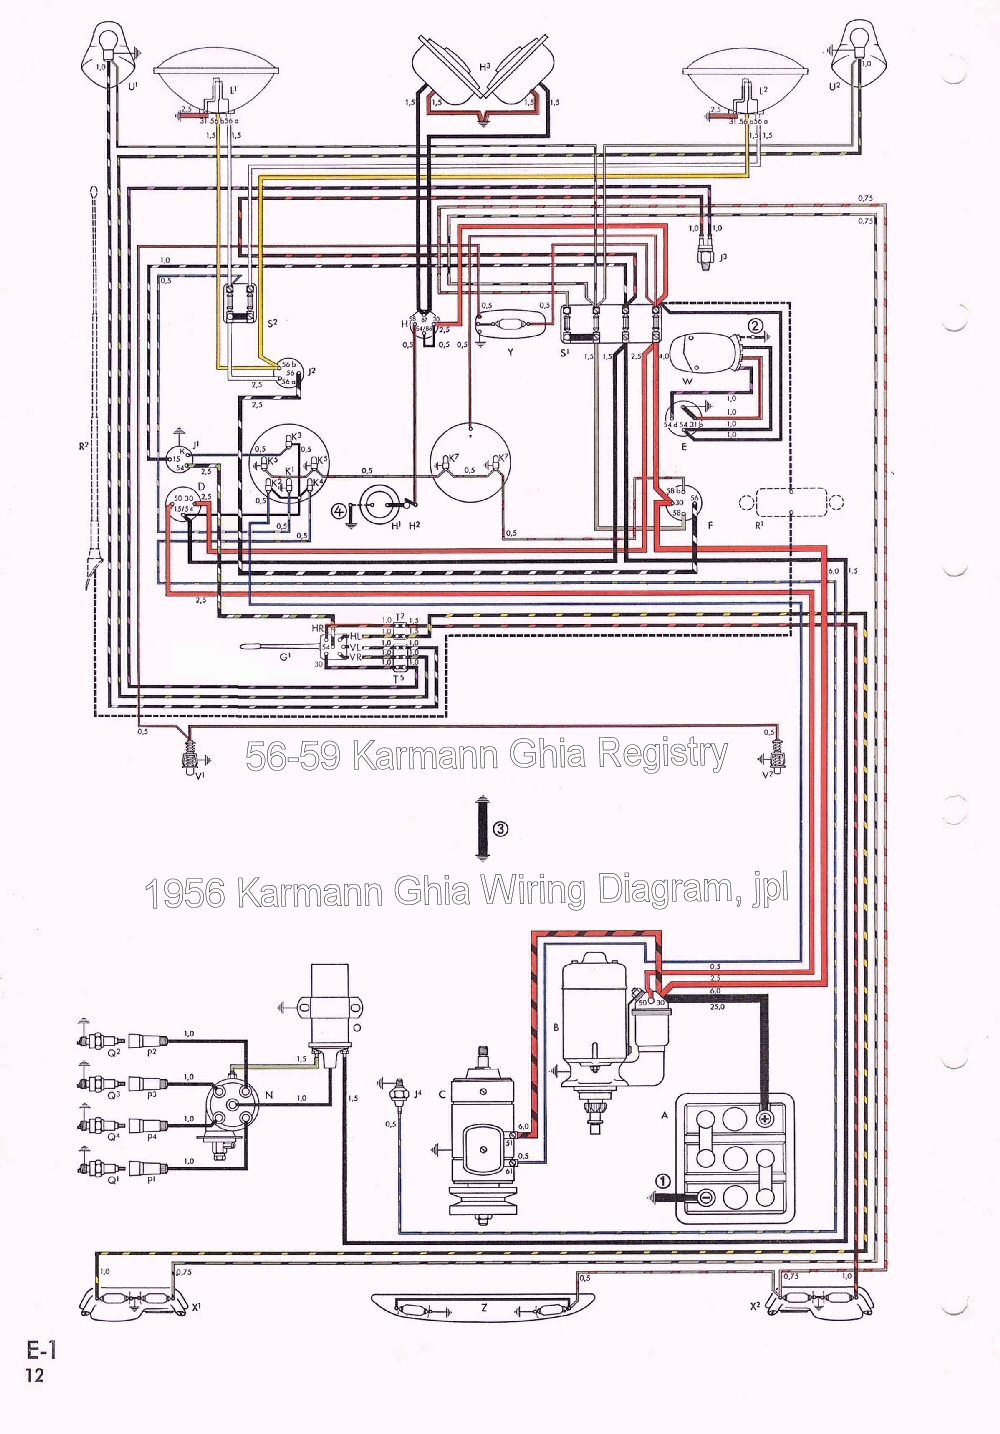 hight resolution of karmann ghia wiring diagrams wiringsoft2ax wiringsoft2a wiringasoft3x wiringasoft3 wiring3x wiring3